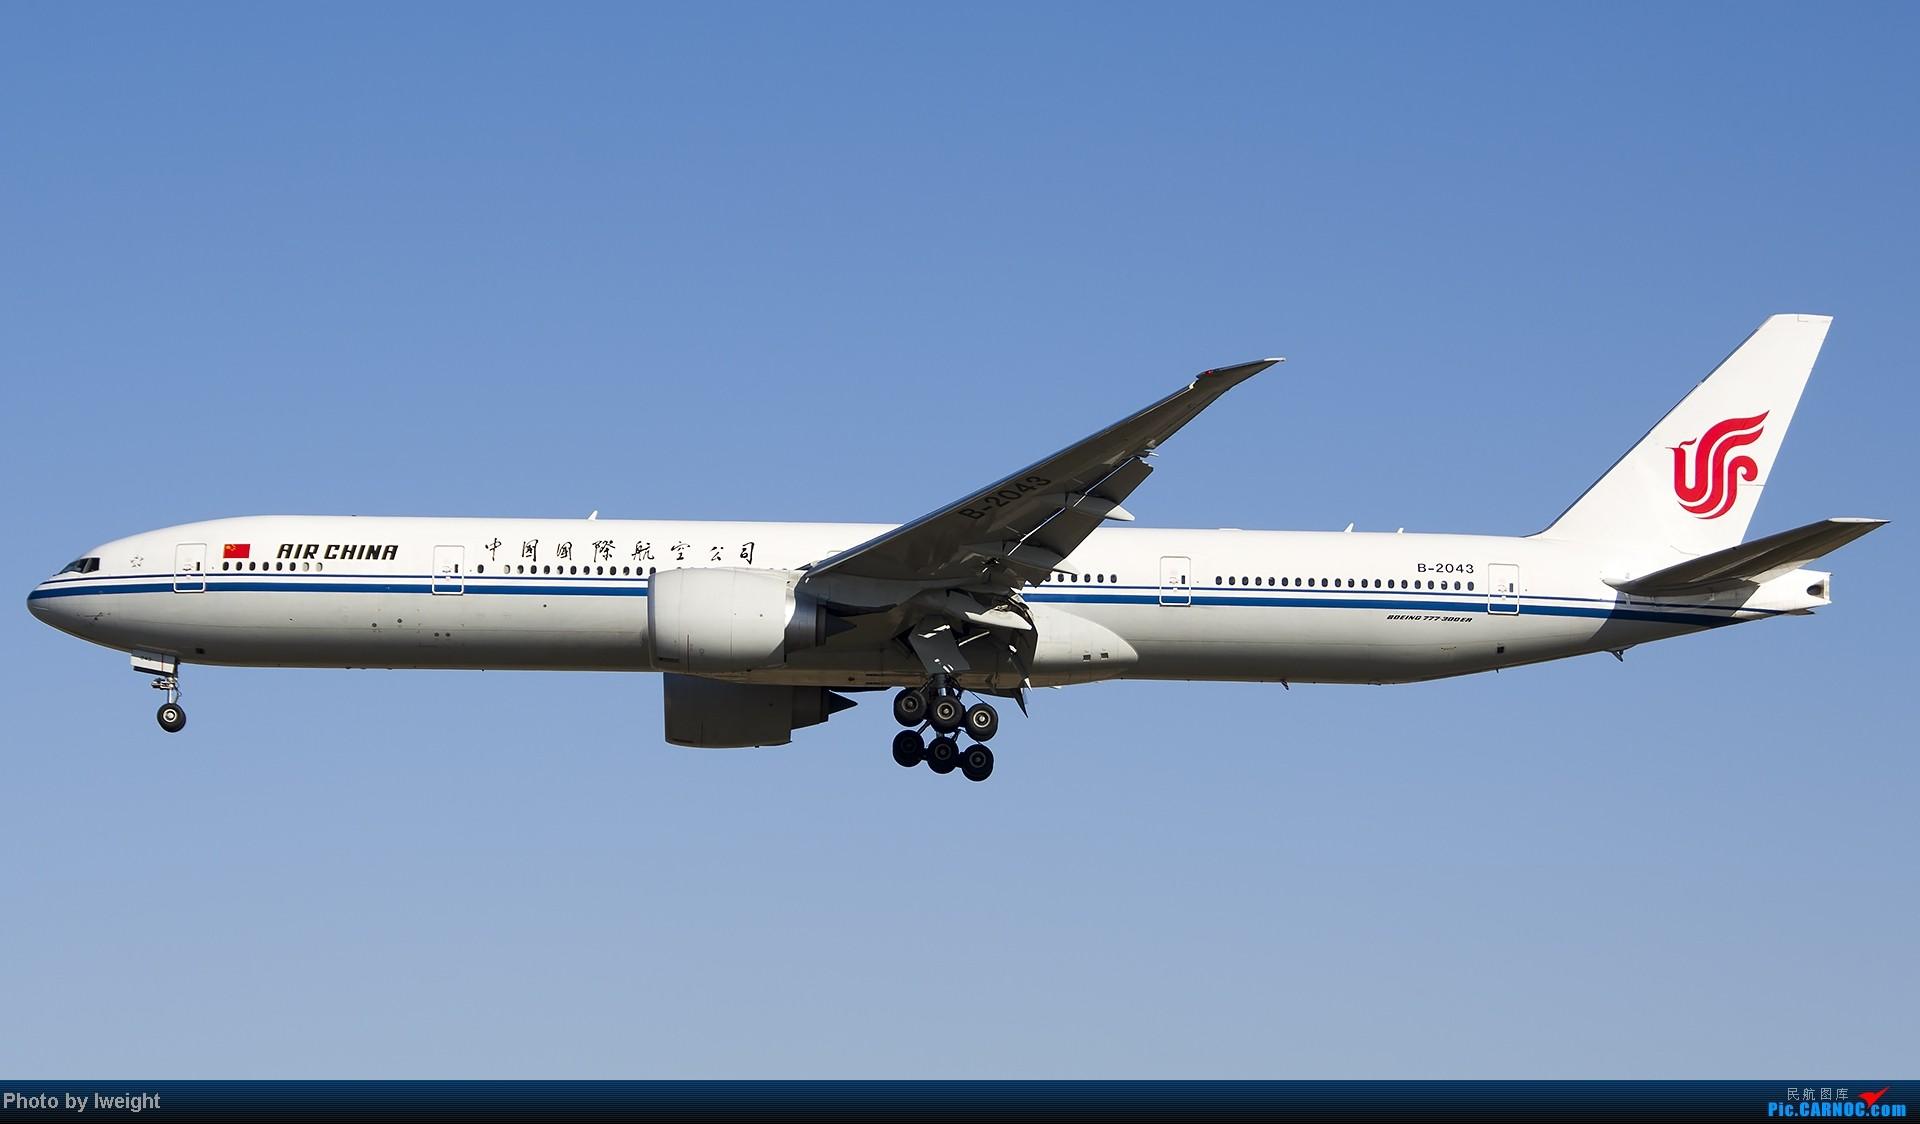 Re:[原创]抓住APEC蓝的尾巴,再拍上一组 BOEING 777-300ER B-2043 中国北京首都机场